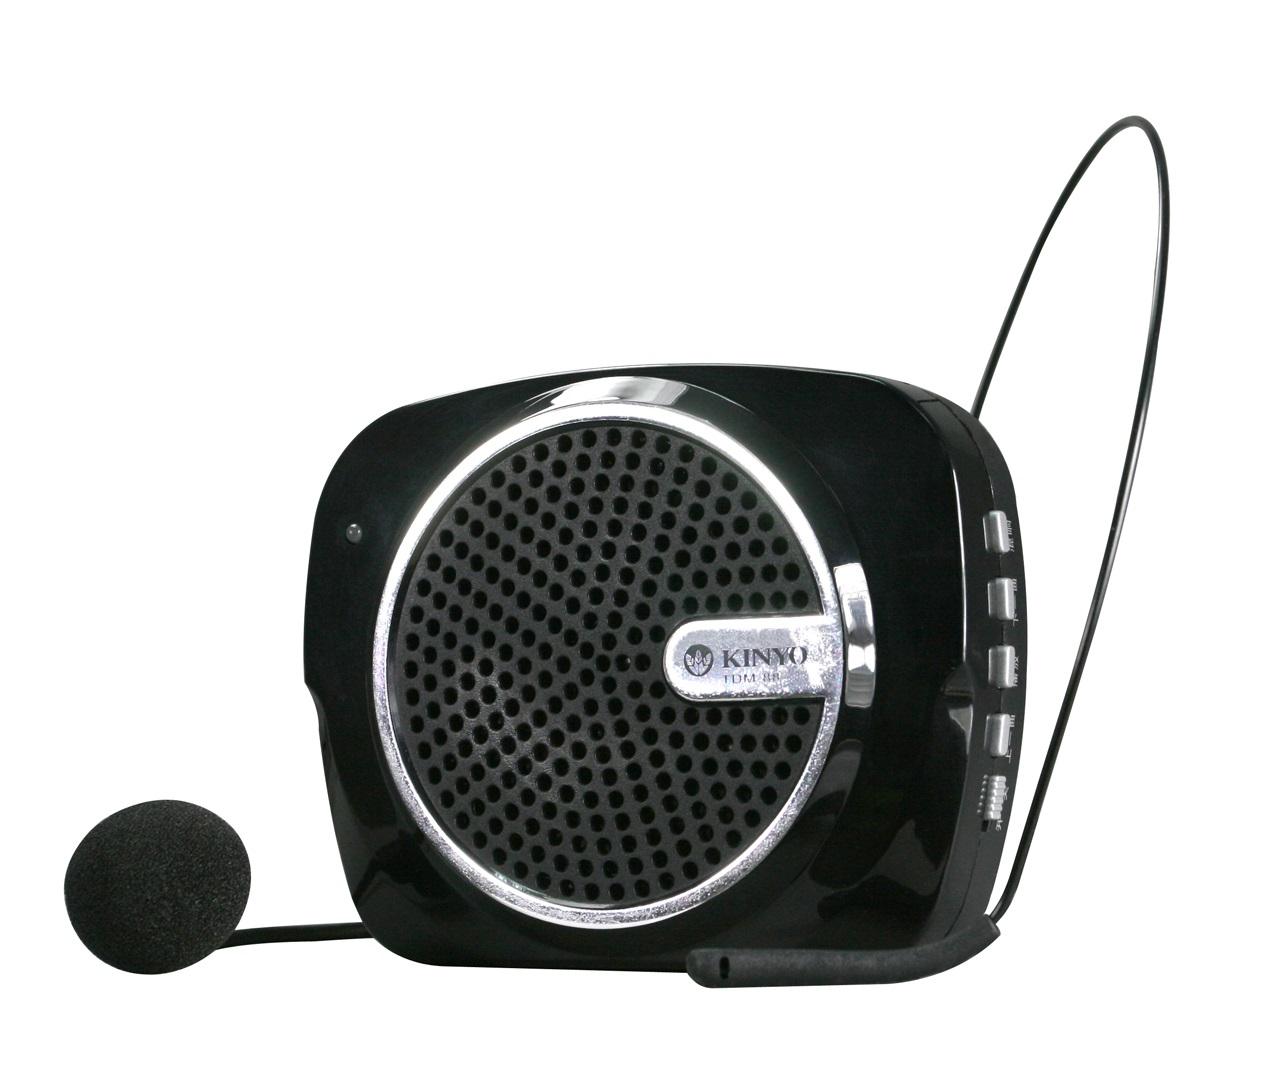 KINYO腰掛充電式多功能擴音器(TDM-88)